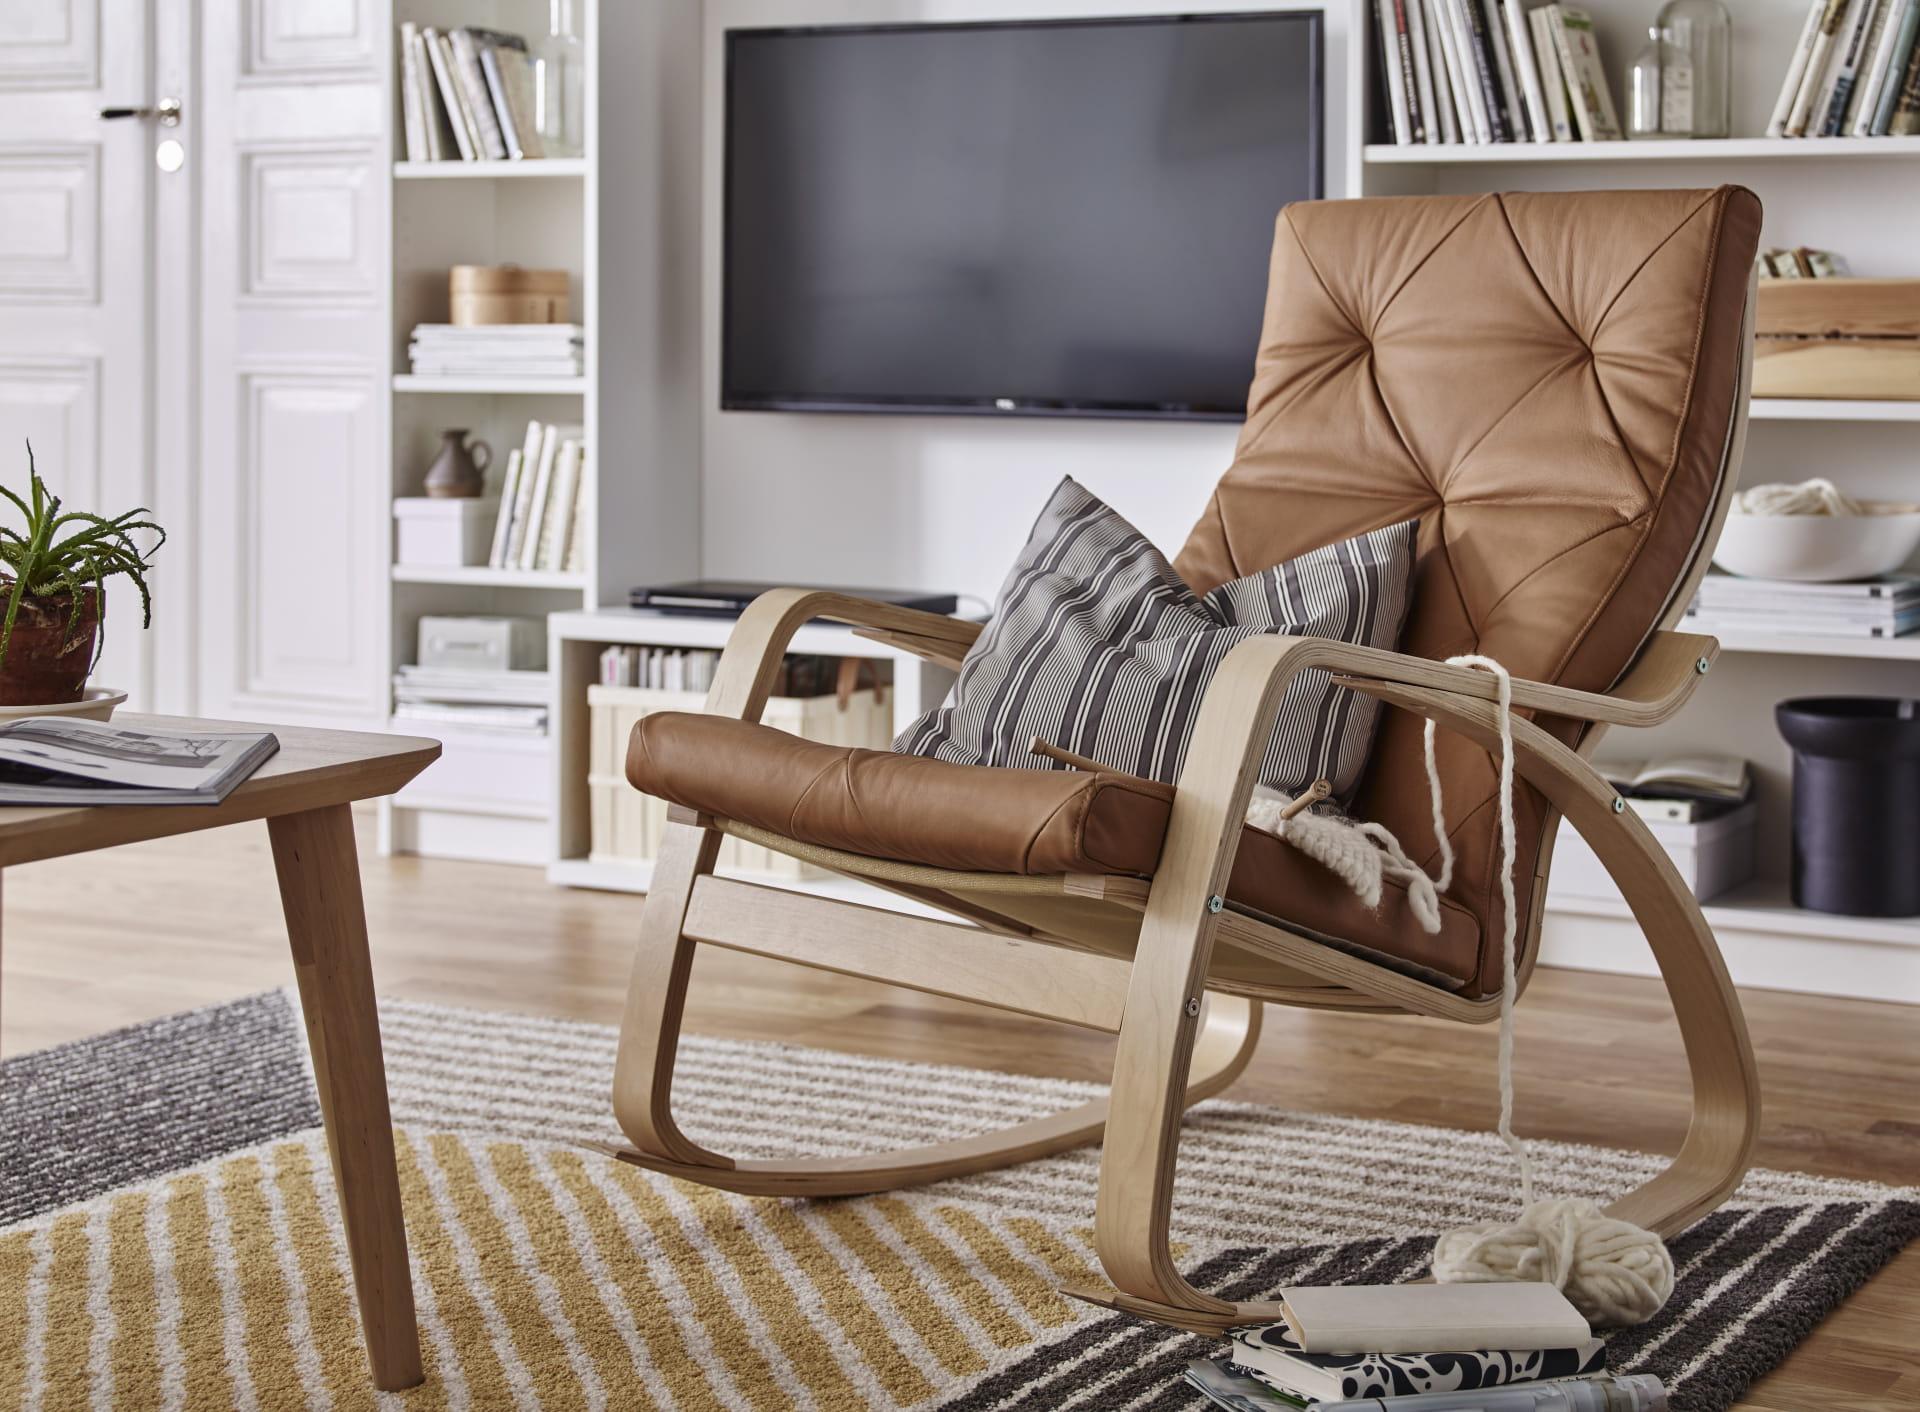 le fauteuil pong en cuir nature prix 250 euros ikea - Ikea Fauteuil